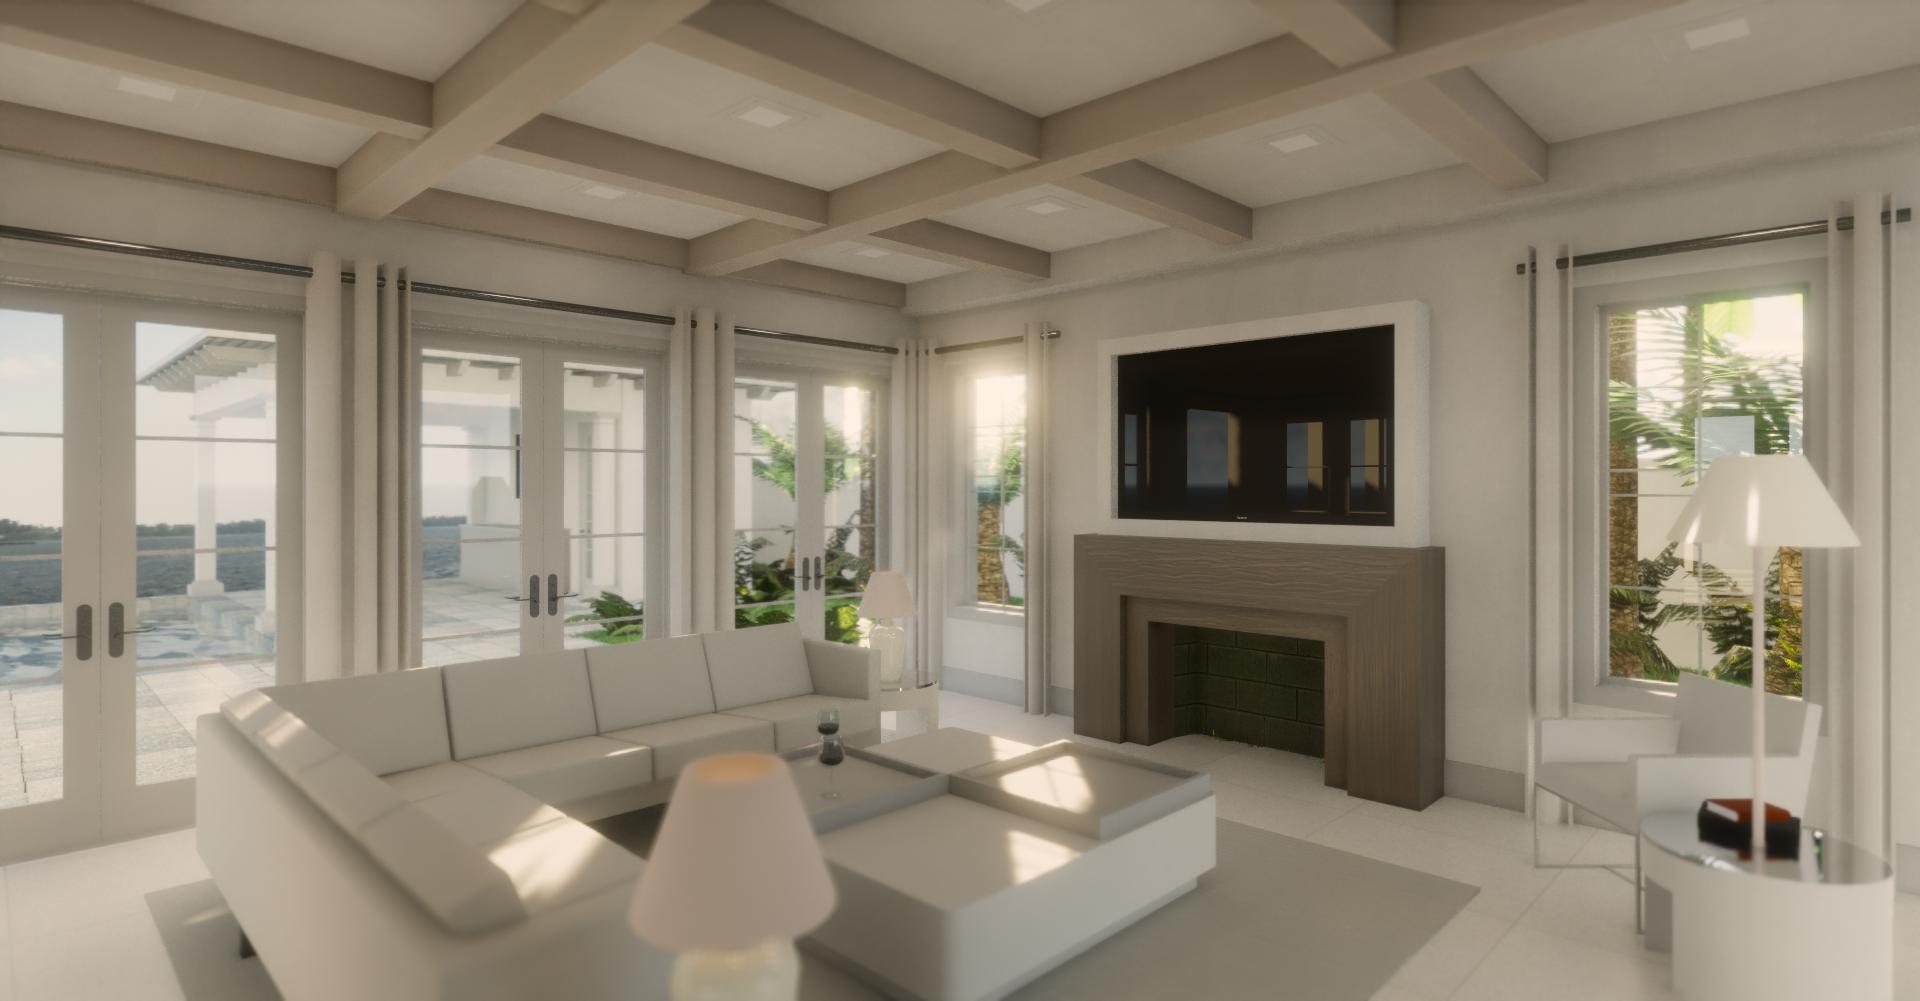 rendering of family room